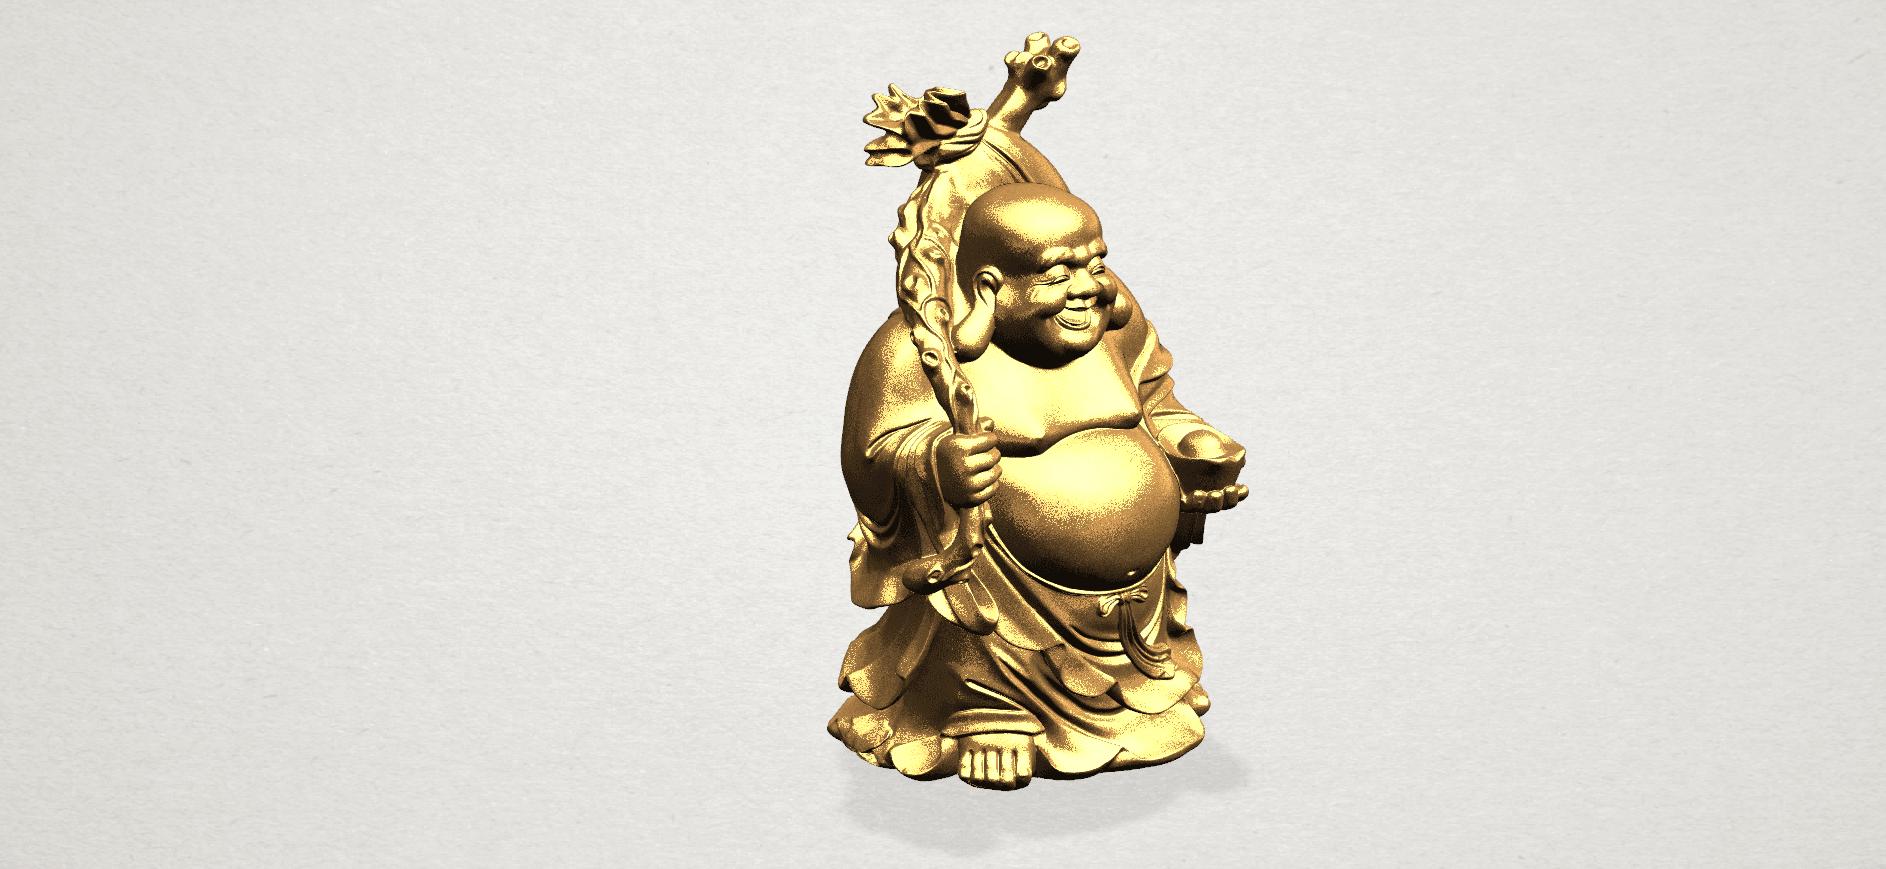 Metteyya Buddha 05 - 88mm - A09.png Télécharger fichier STL gratuit Bouddha Metteyya 05 • Objet imprimable en 3D, GeorgesNikkei